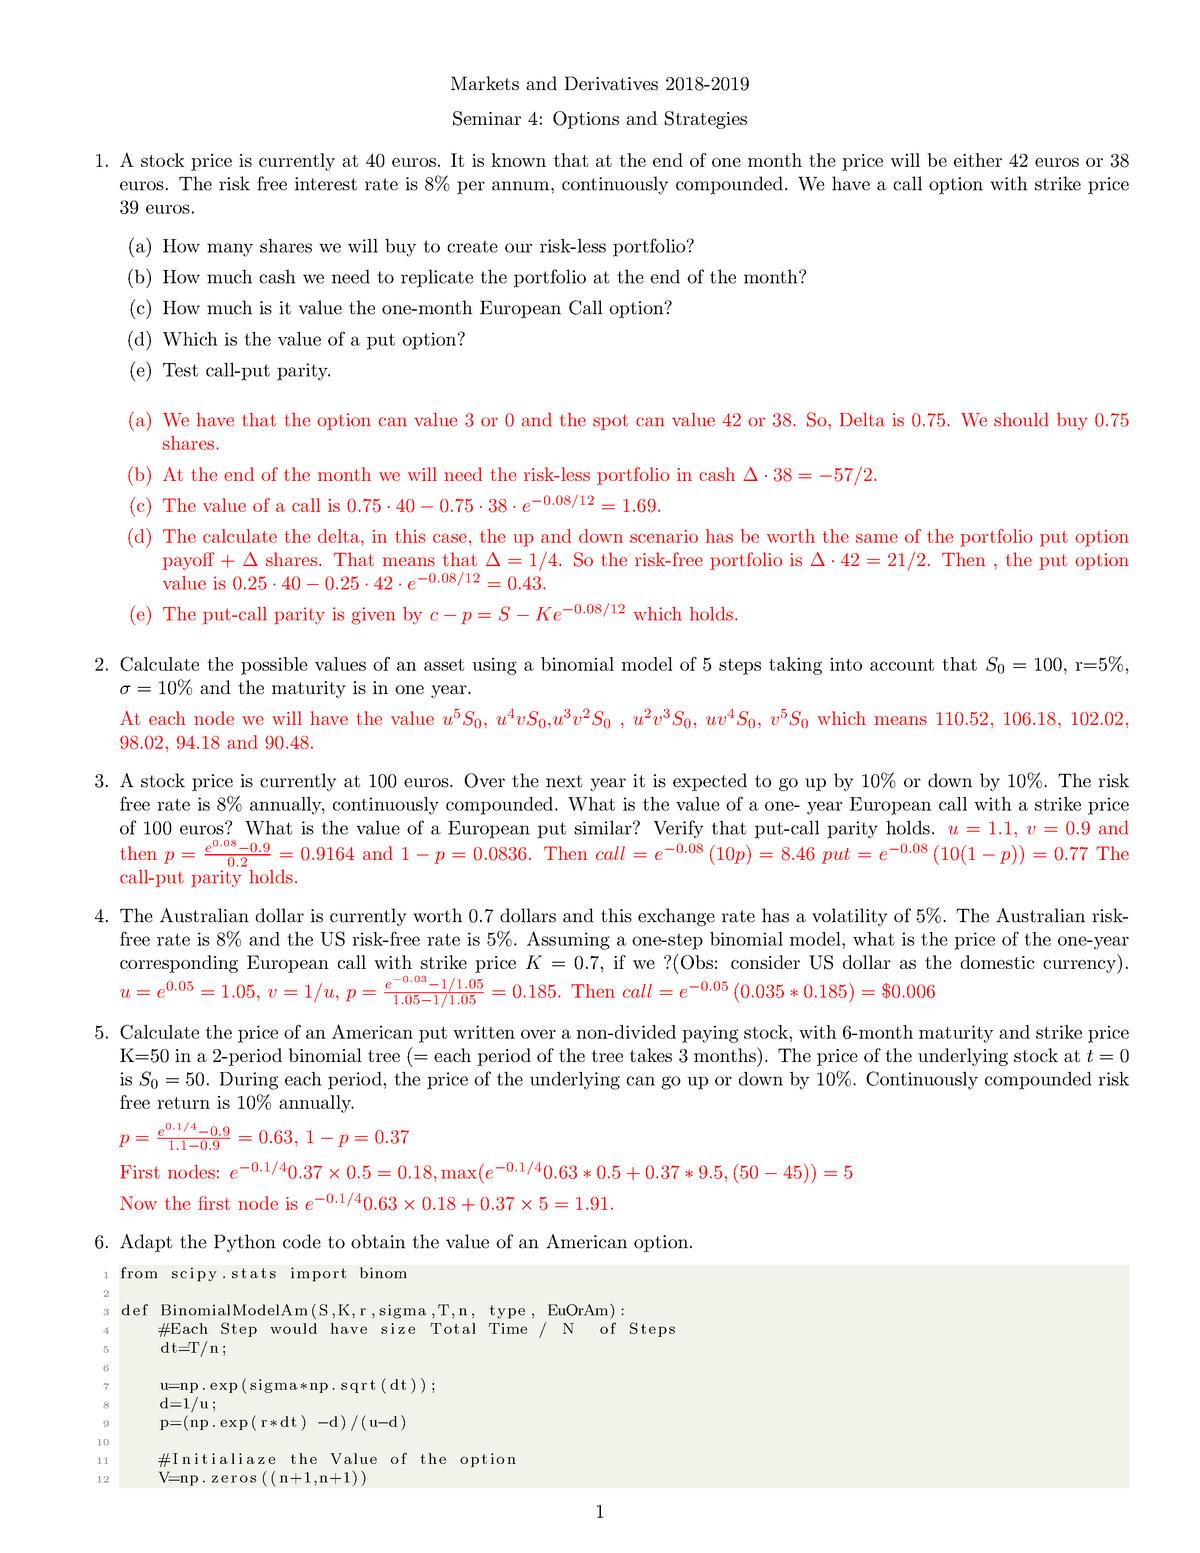 Seminar 4 - Binomial Tree - Solutions - Market & Derivatives - StuDocu